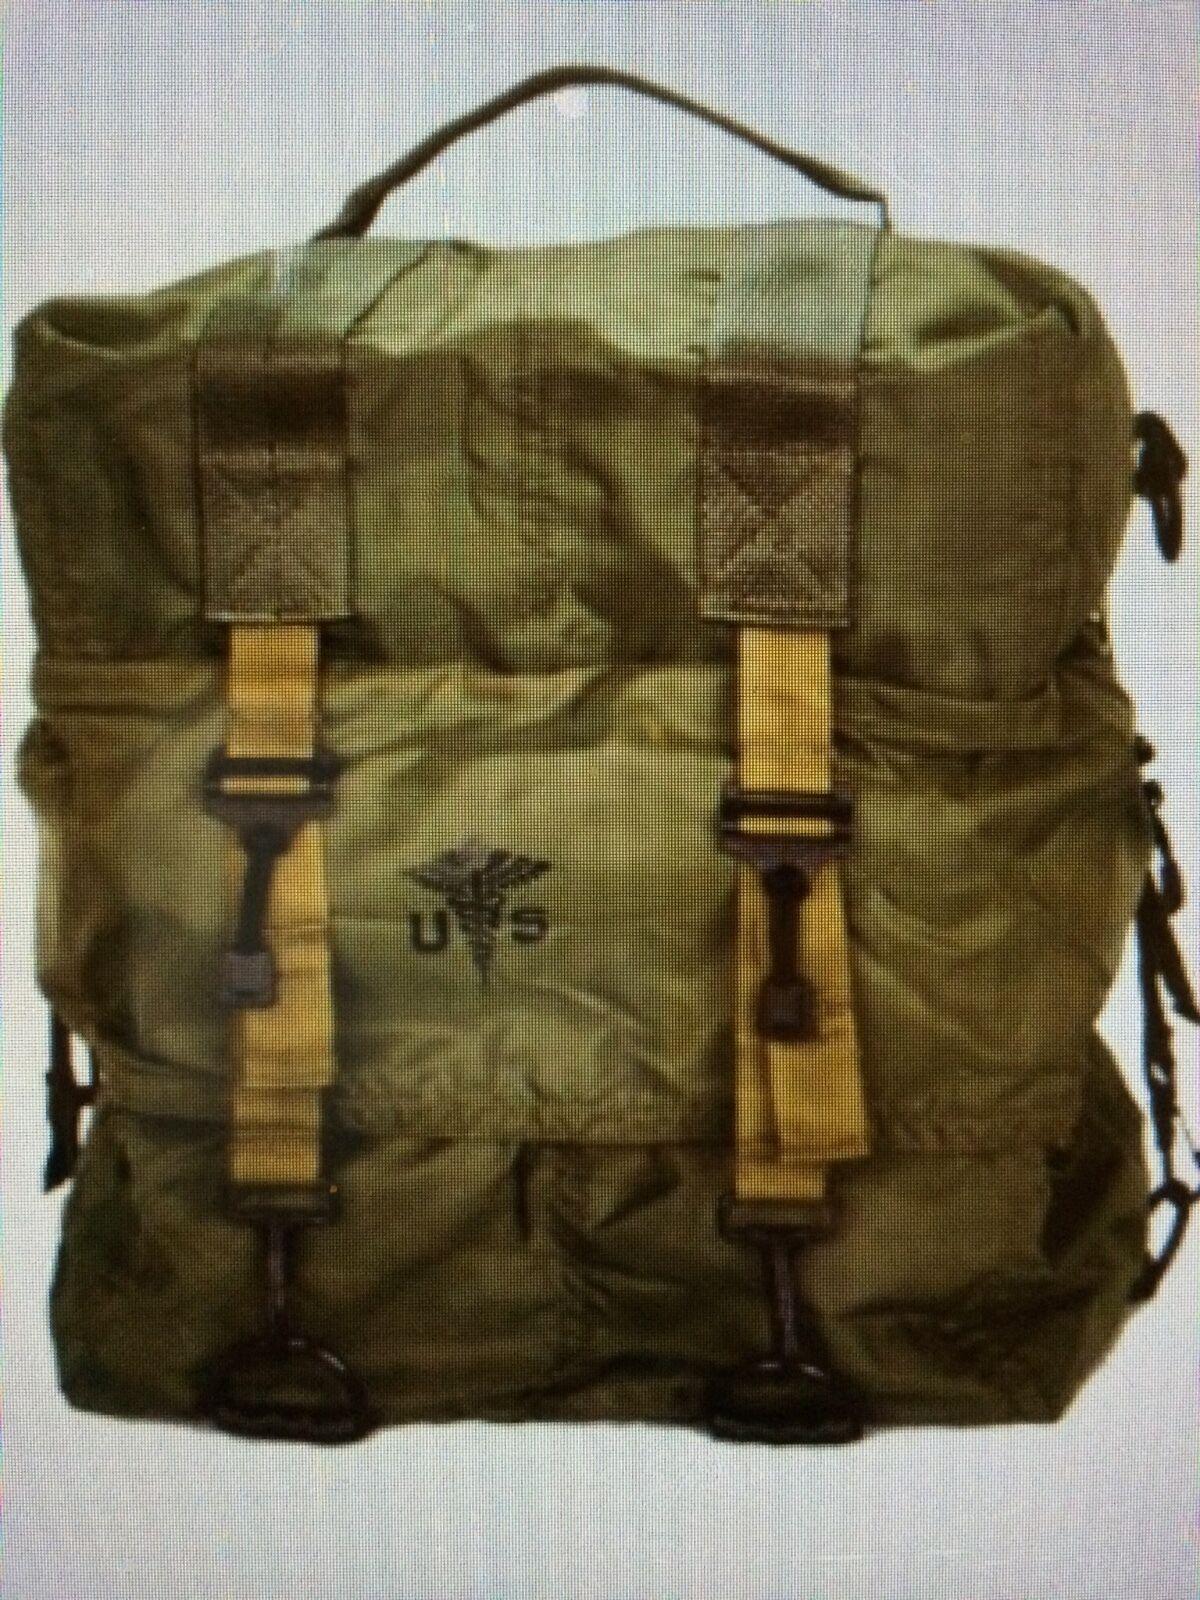 Item 1 New Genuine M17 Us Military Medic Bag Backpack Elite First Aid Army Medical Usmc